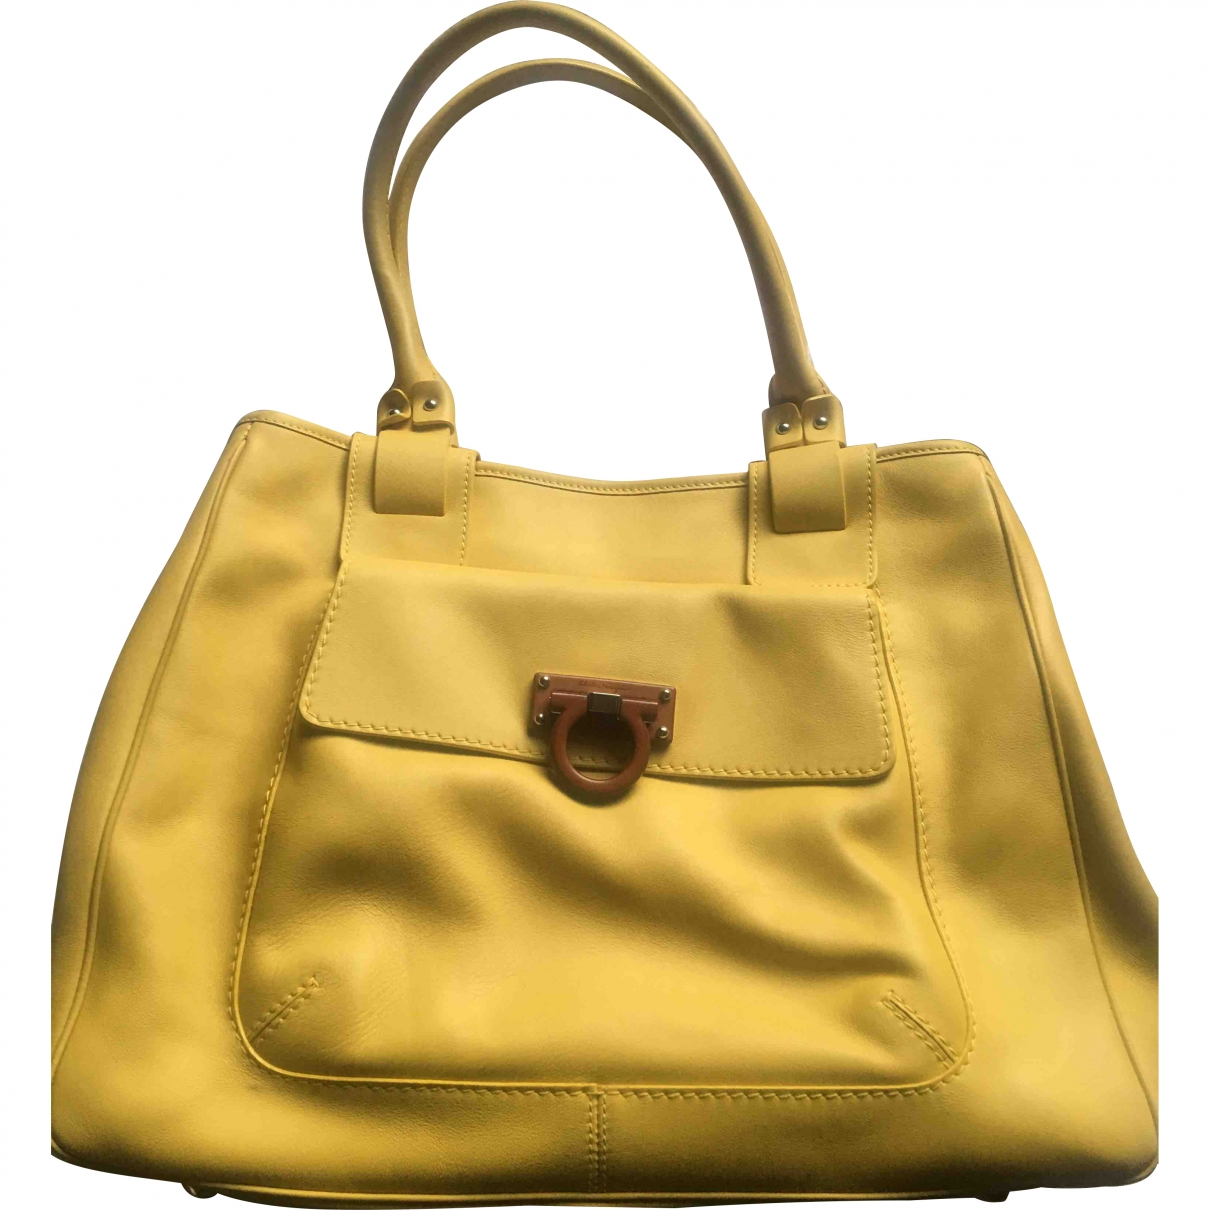 Salvatore Ferragamo \N Yellow Leather handbag for Women \N